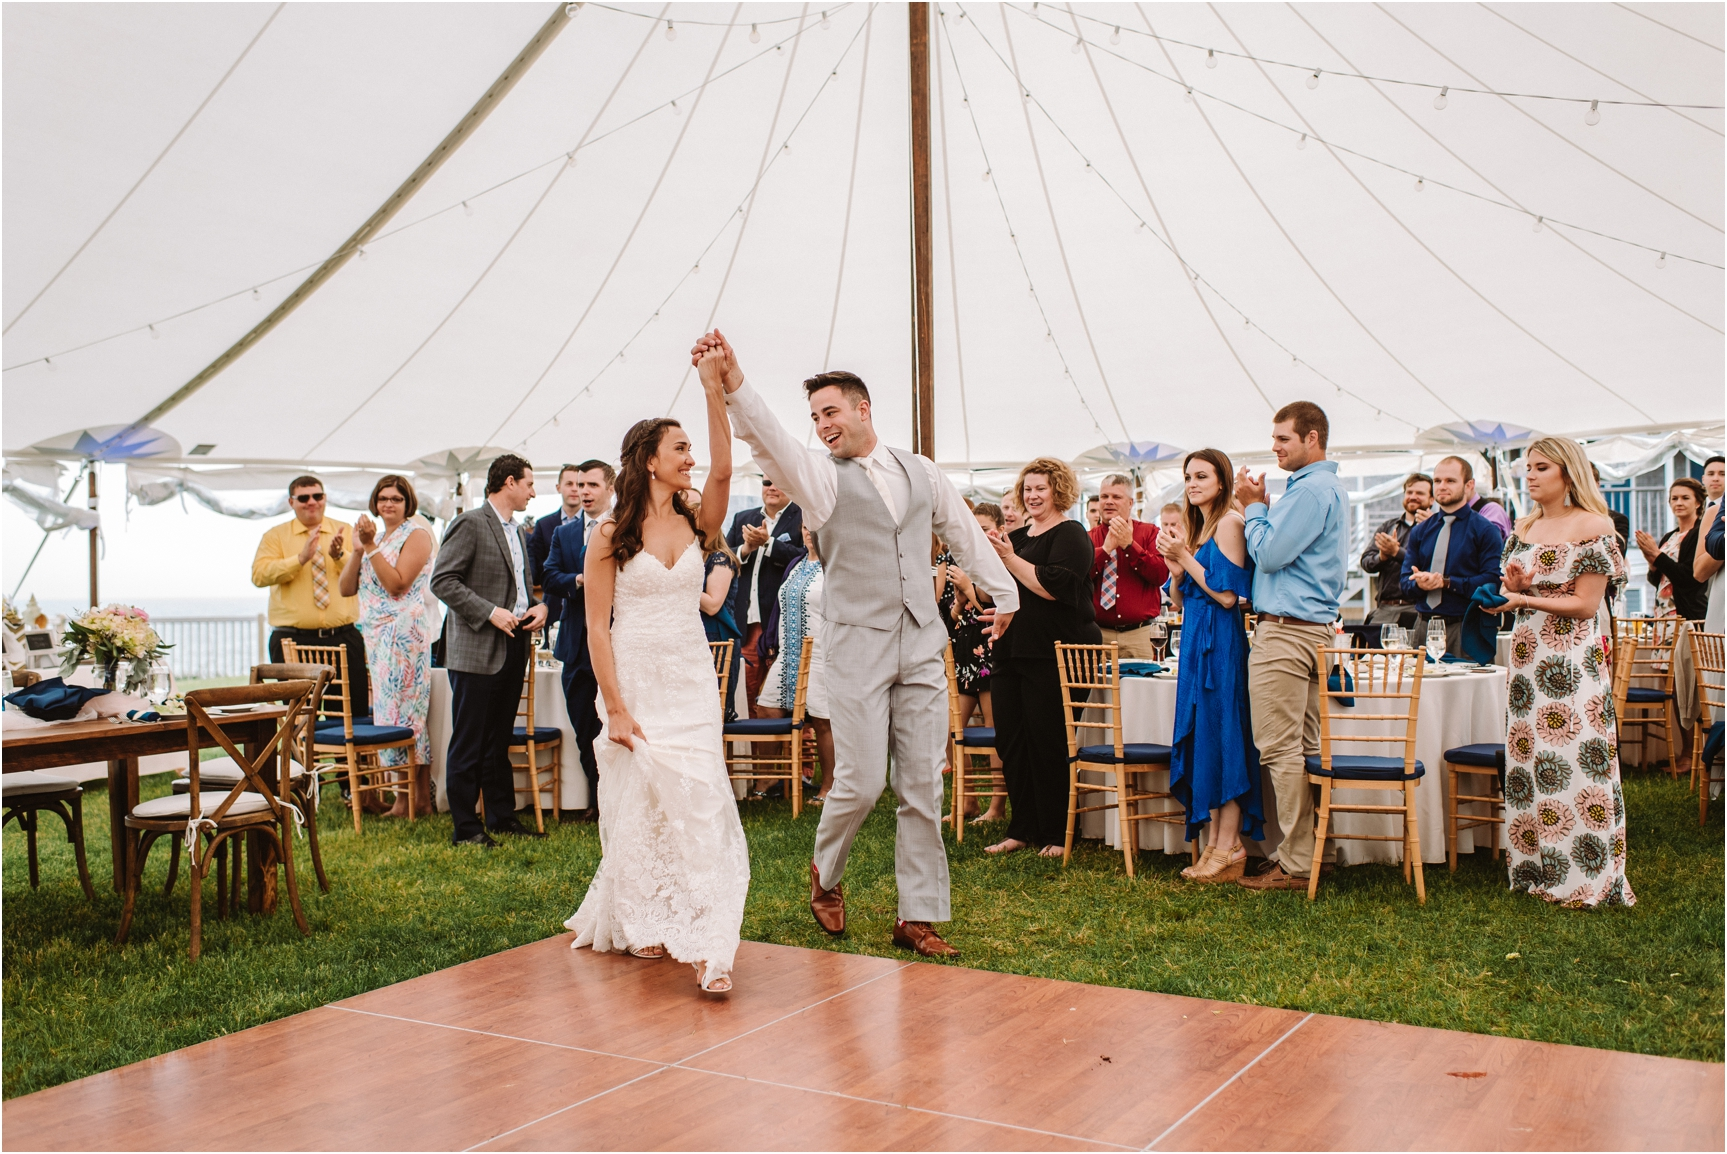 Sarah & Sam Pelham House Cape Cod Wedding Photographer-145.jpg